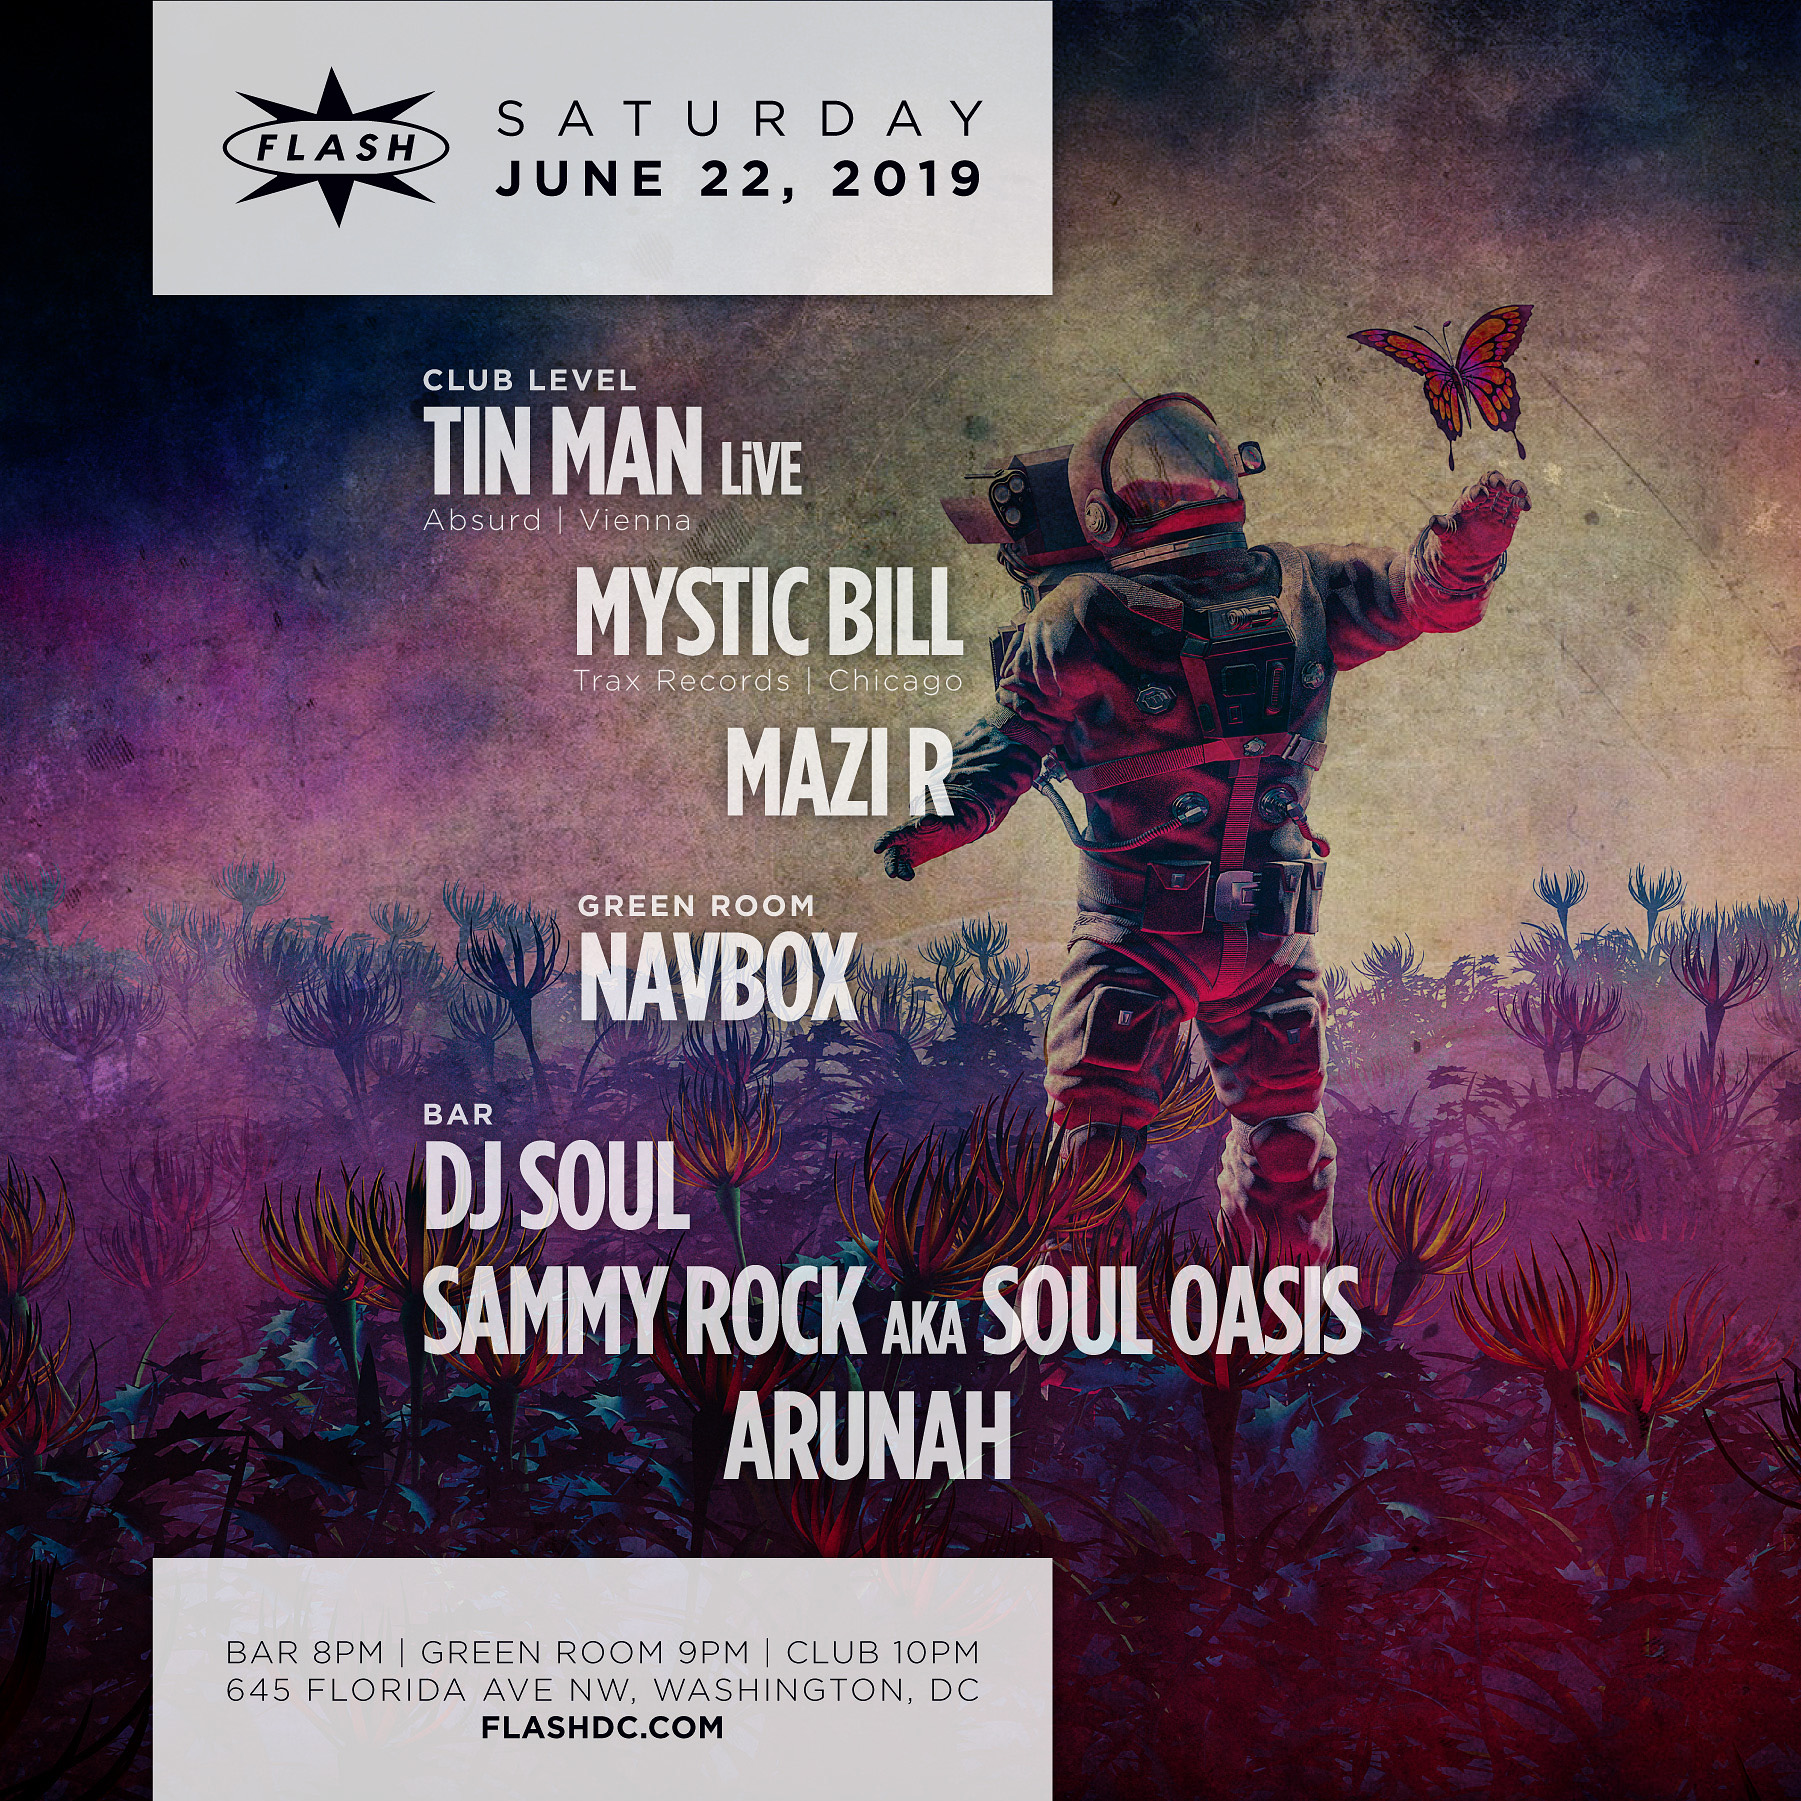 Tin Man LiVE- Mystic Bill event thumbnail